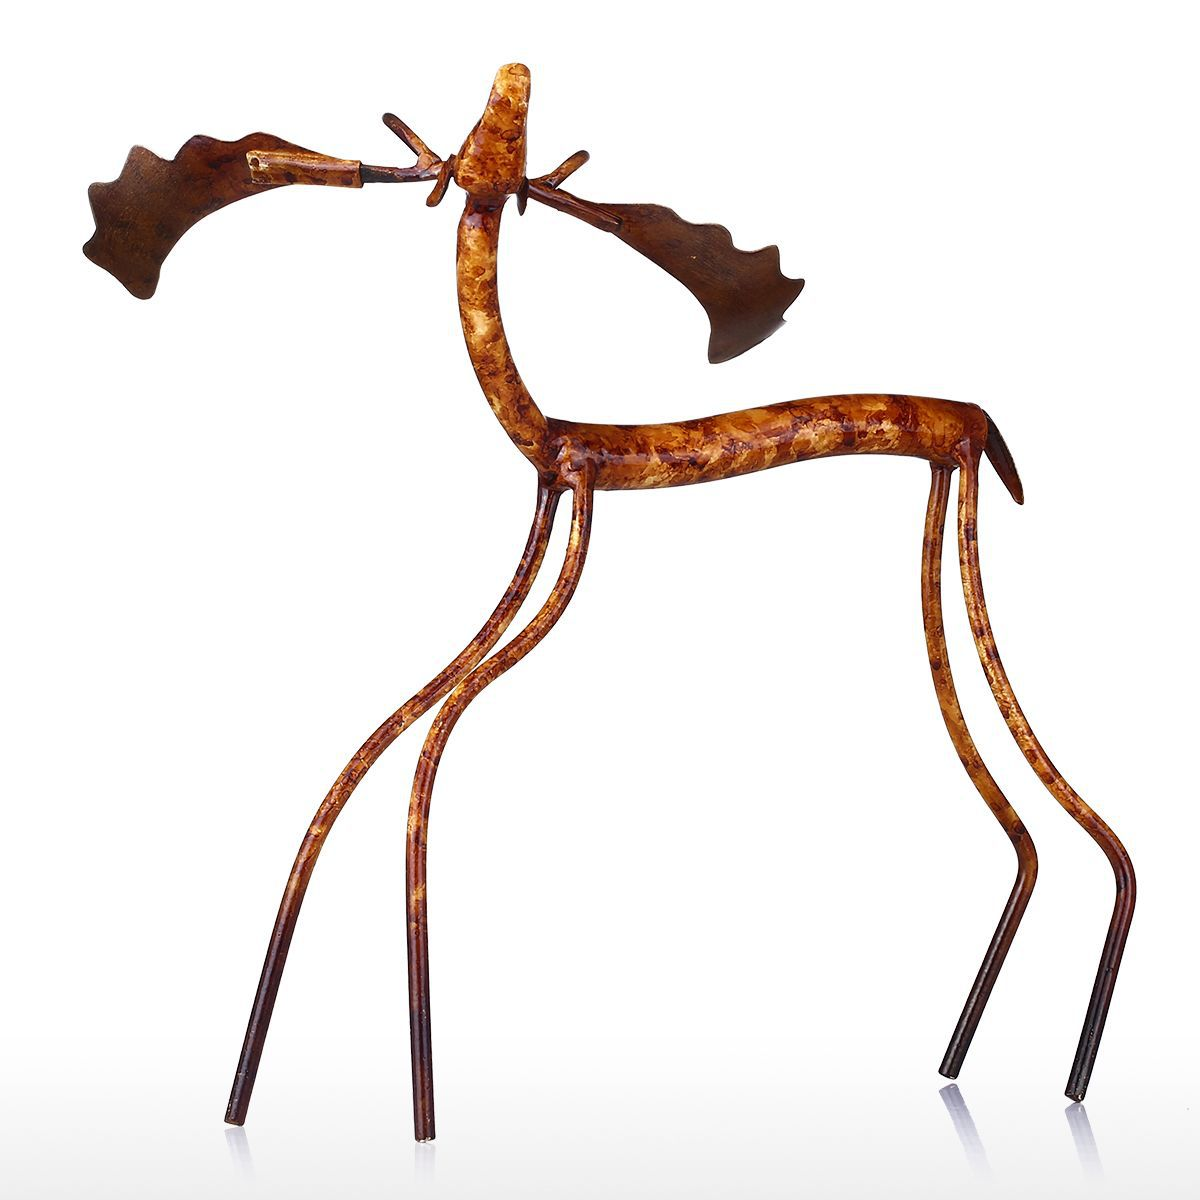 Bow Head Moose Iron Figurine Home Decor Mediterranean Metal Animal Rhaliexpress: Moose Figurines In Home Decor At Home Improvement Advice